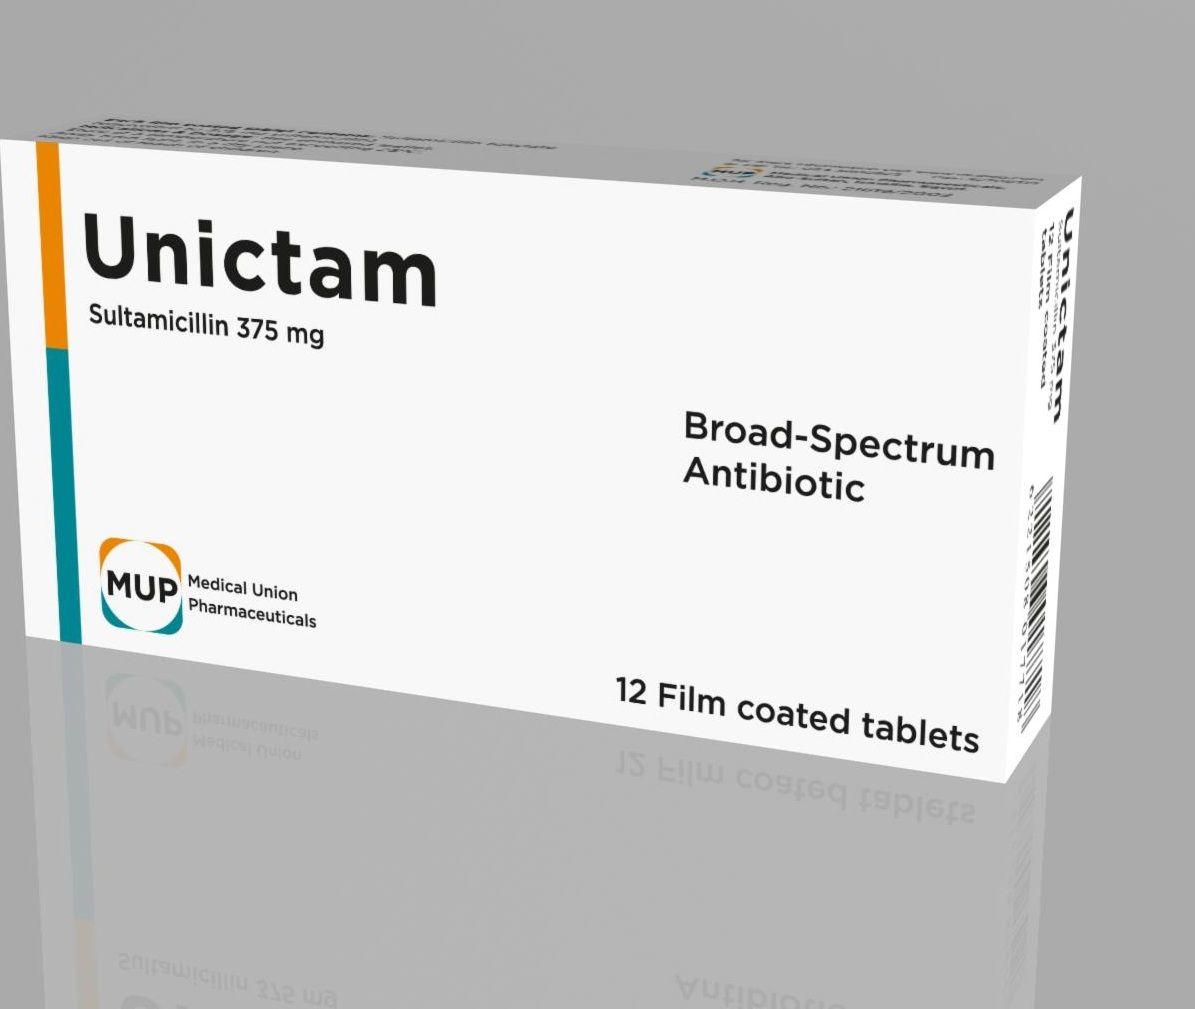 دواء يونيكتام Unictam استخدامات علاج يونيكتام للحامل مضاد حيوي للاطفال Medical Pharmaceutical Antibiotic